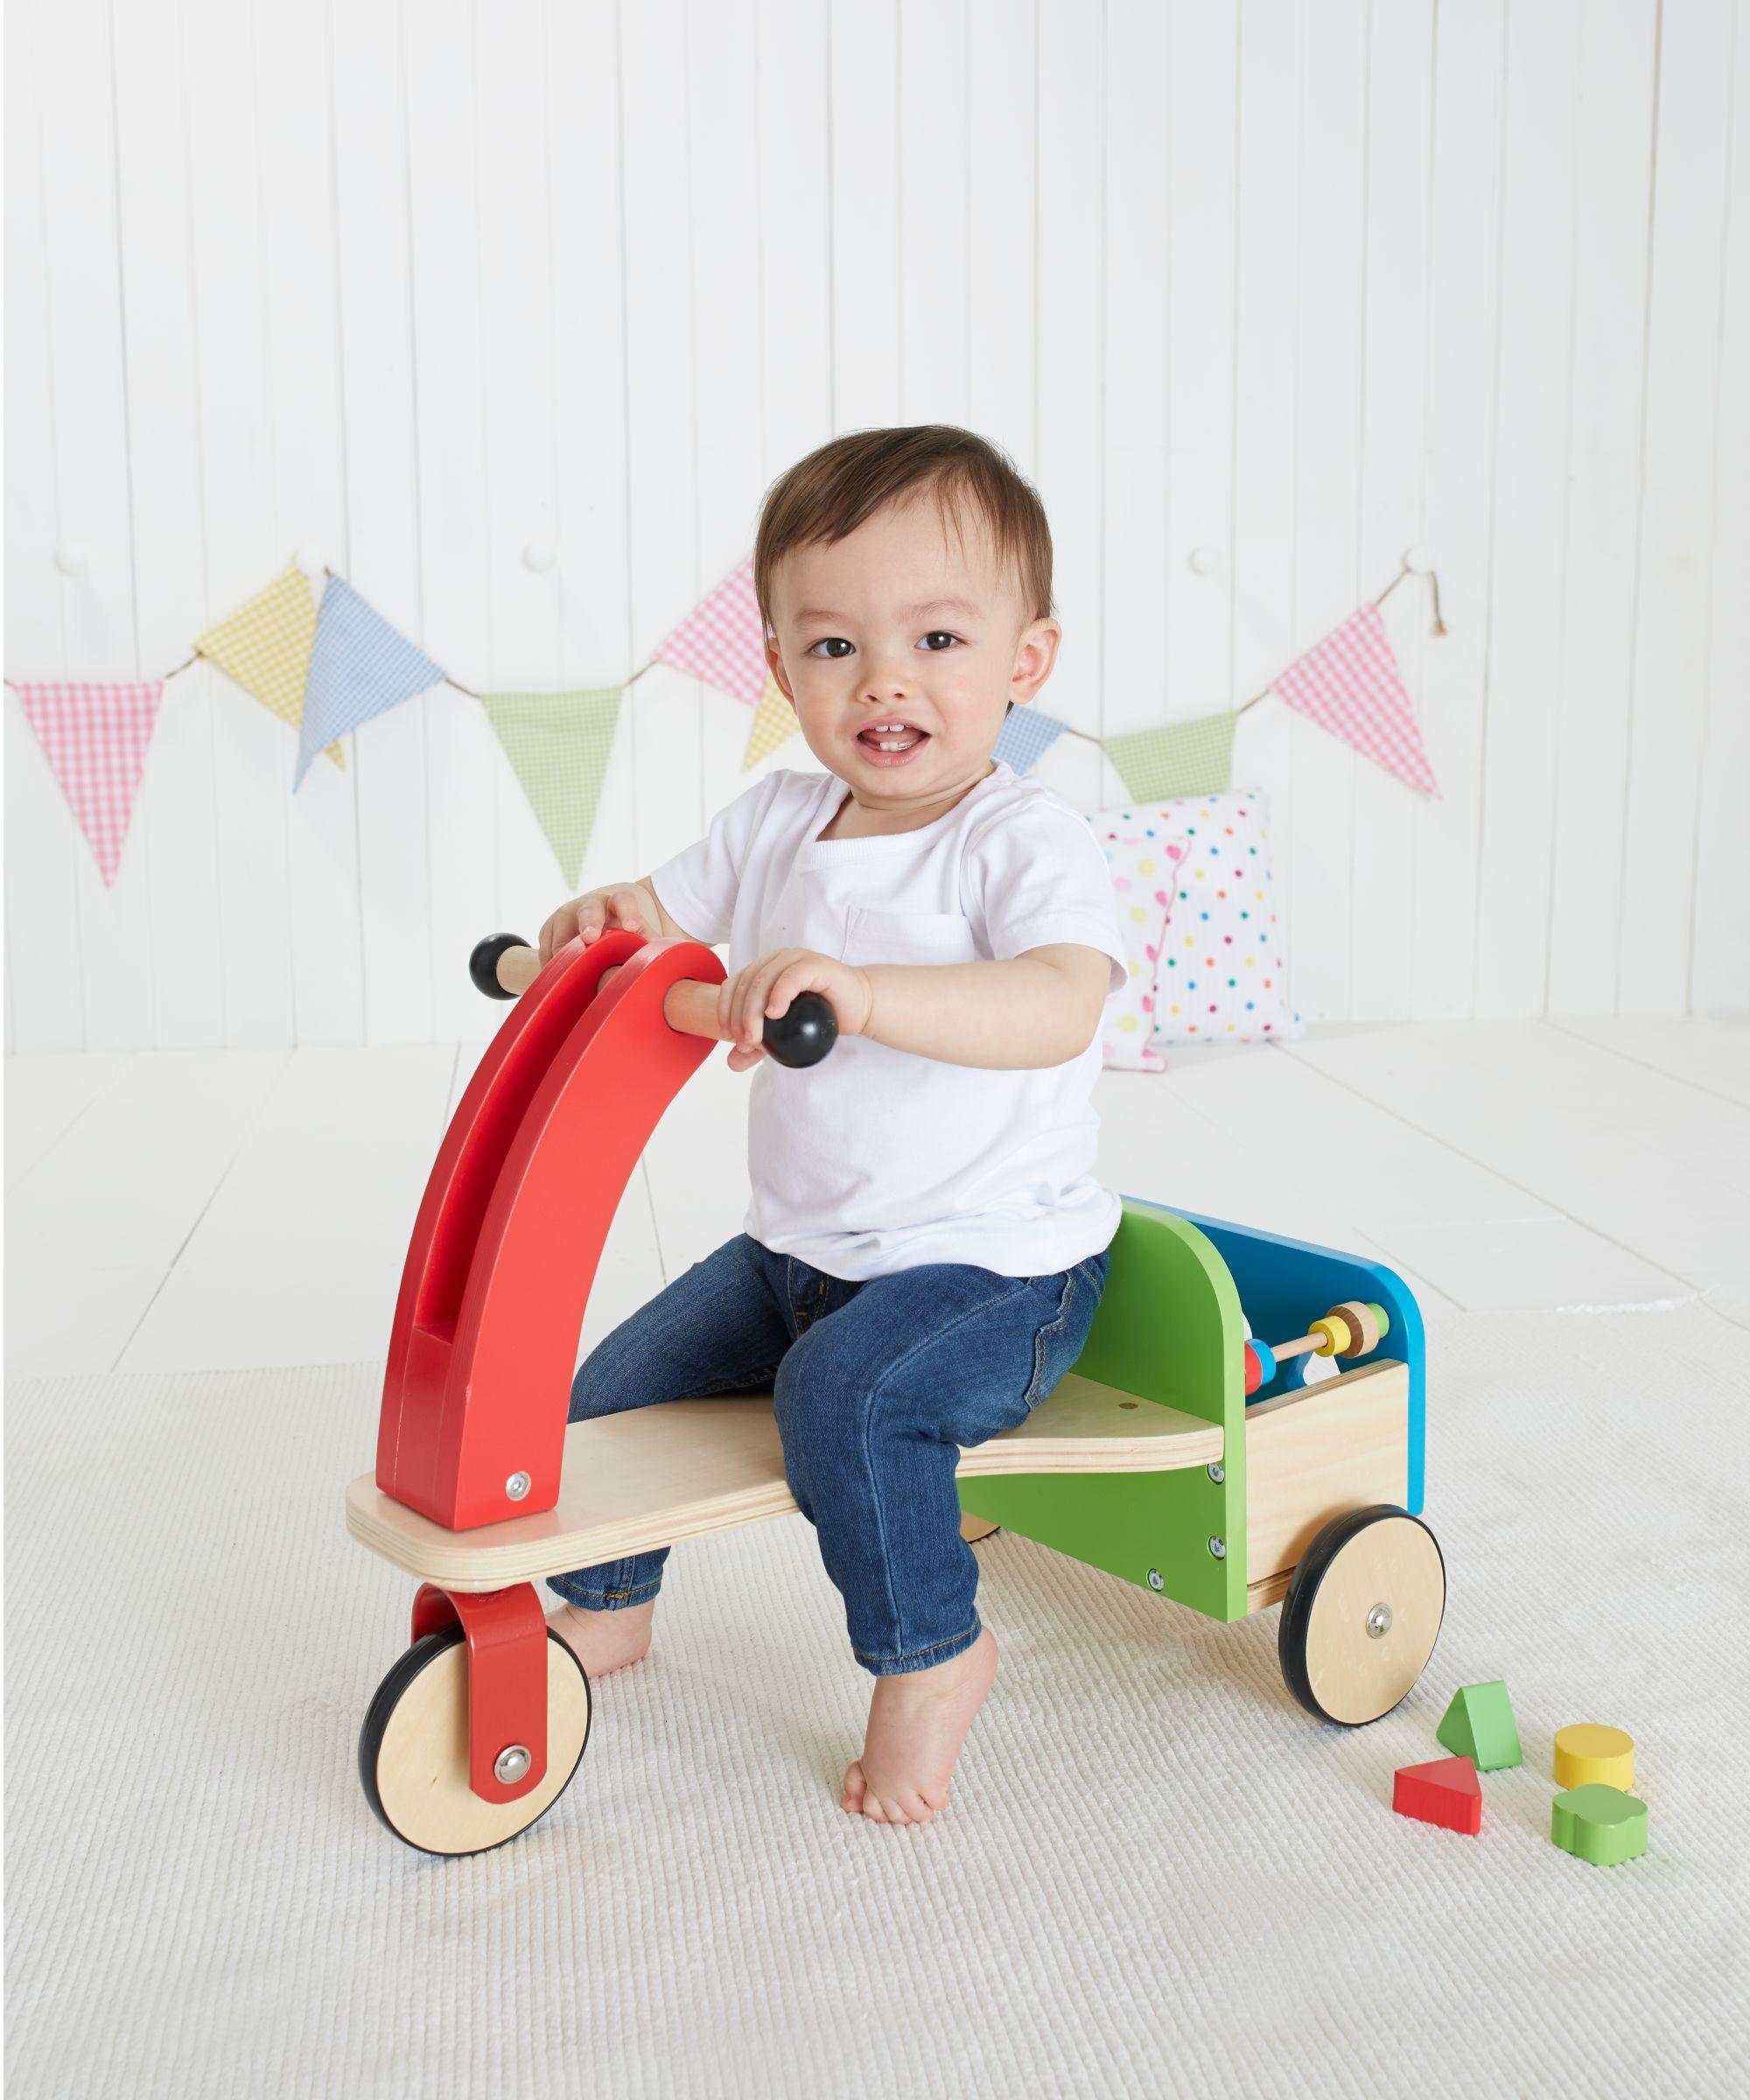 cbc2906ee85 Wooden Trike and Trailer Wooden Kitchen, Toy Kitchen, Kids Blocks, Baby  Ride On